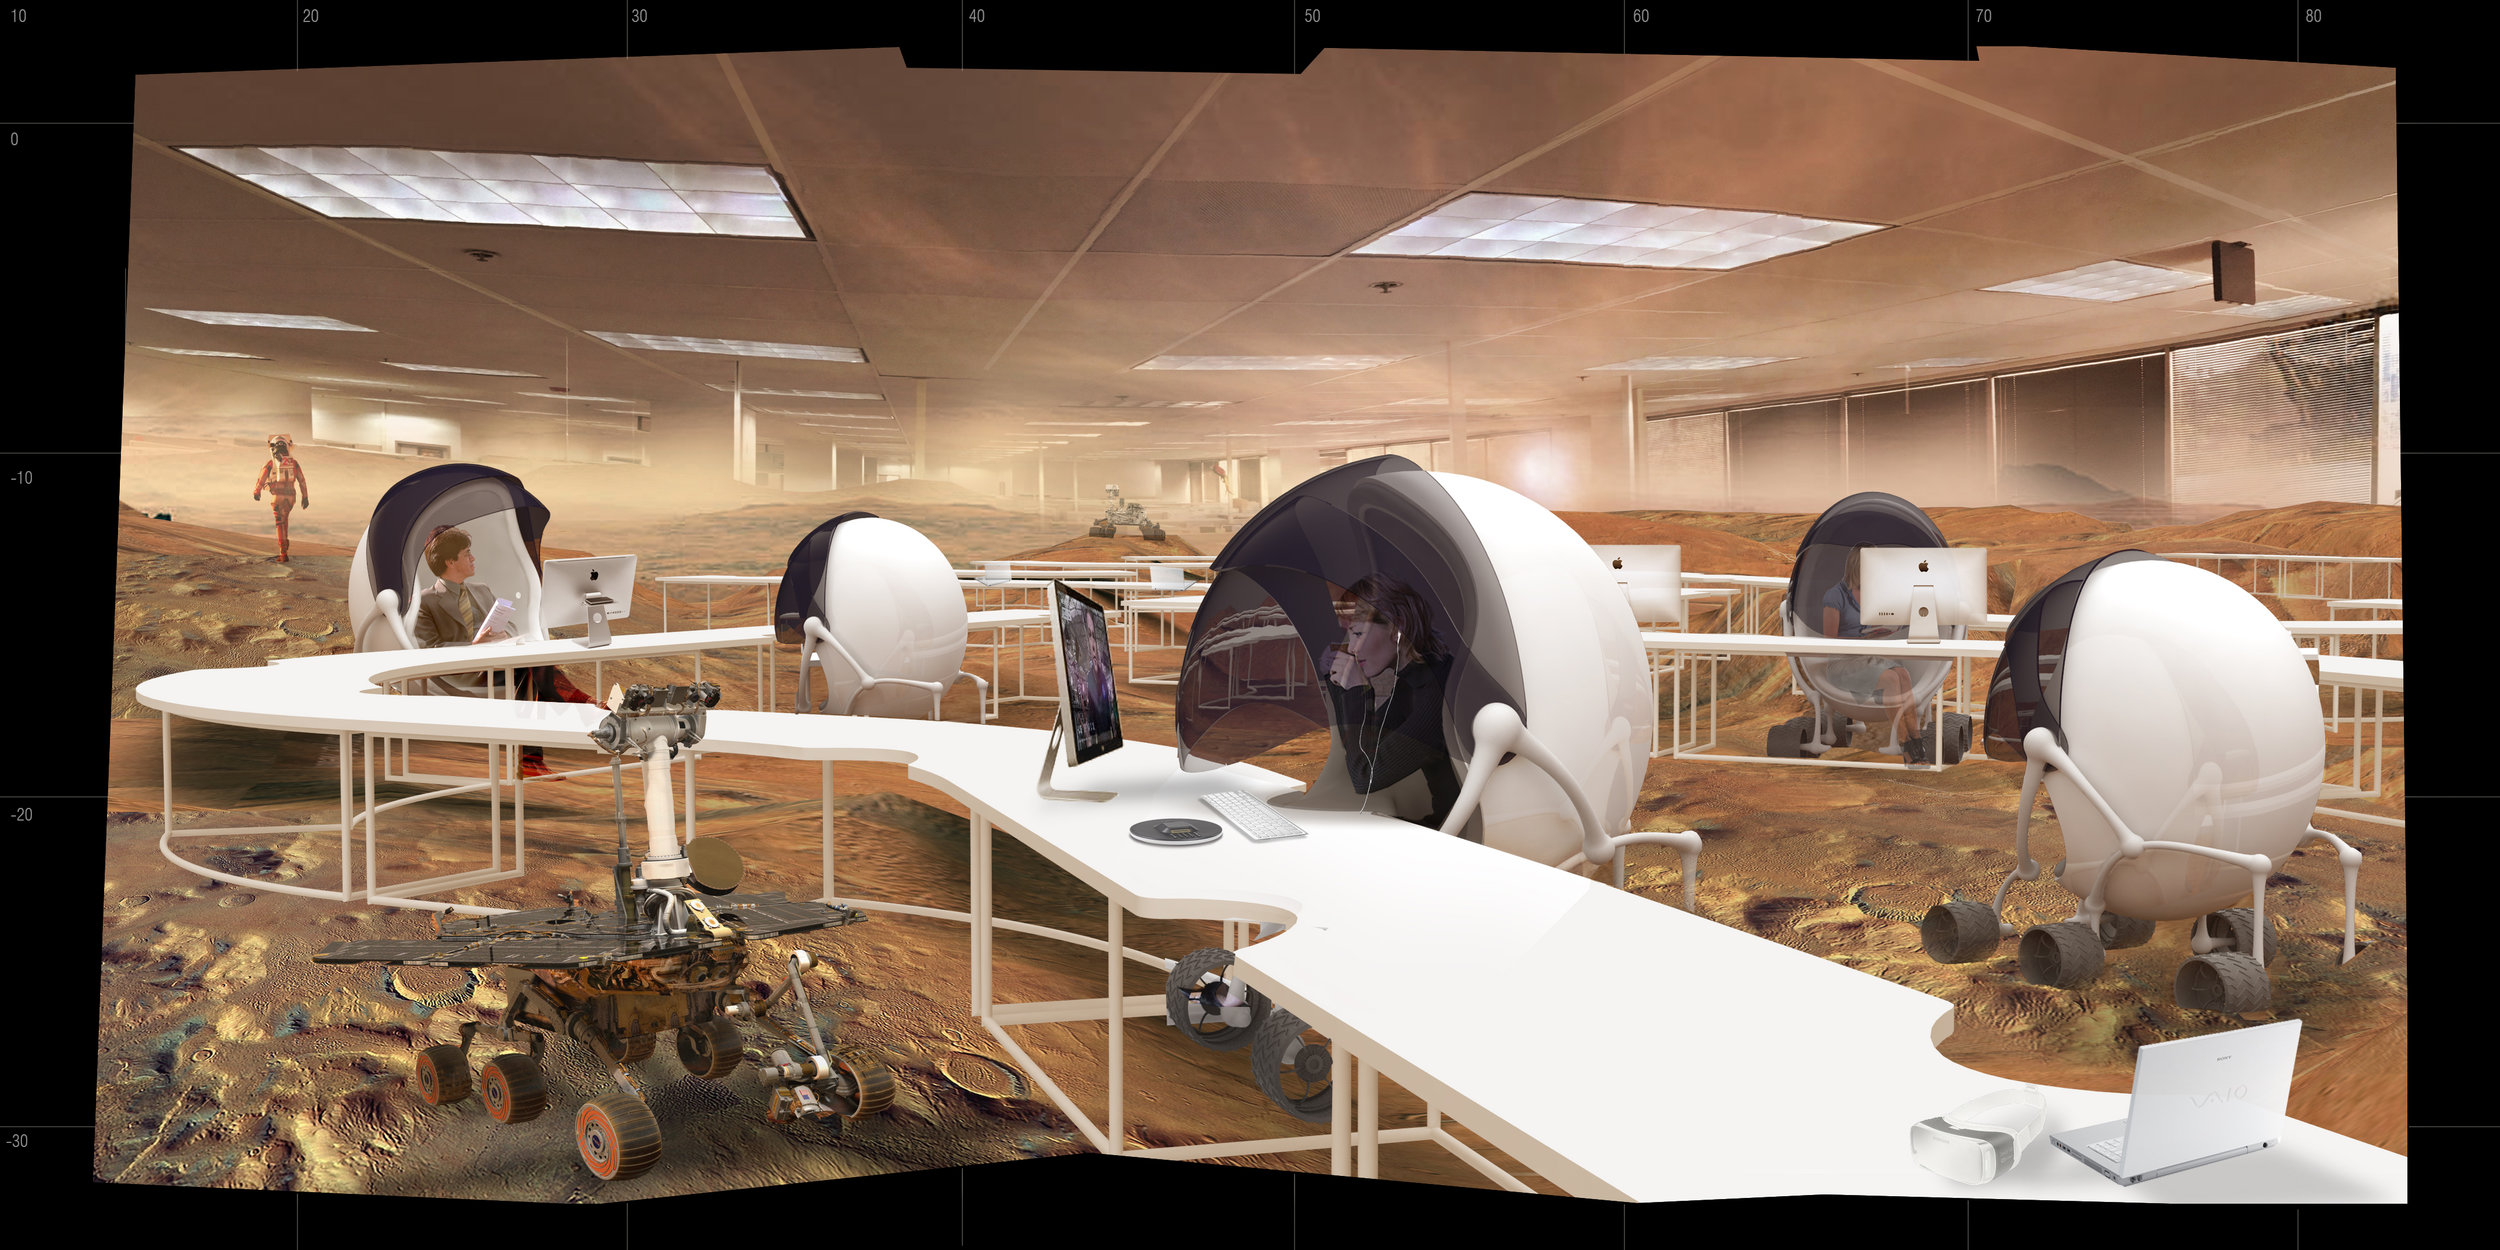 AN.ONYMOUS_DEEP.THINK_PRODUCTIVITY_NASA_JPL